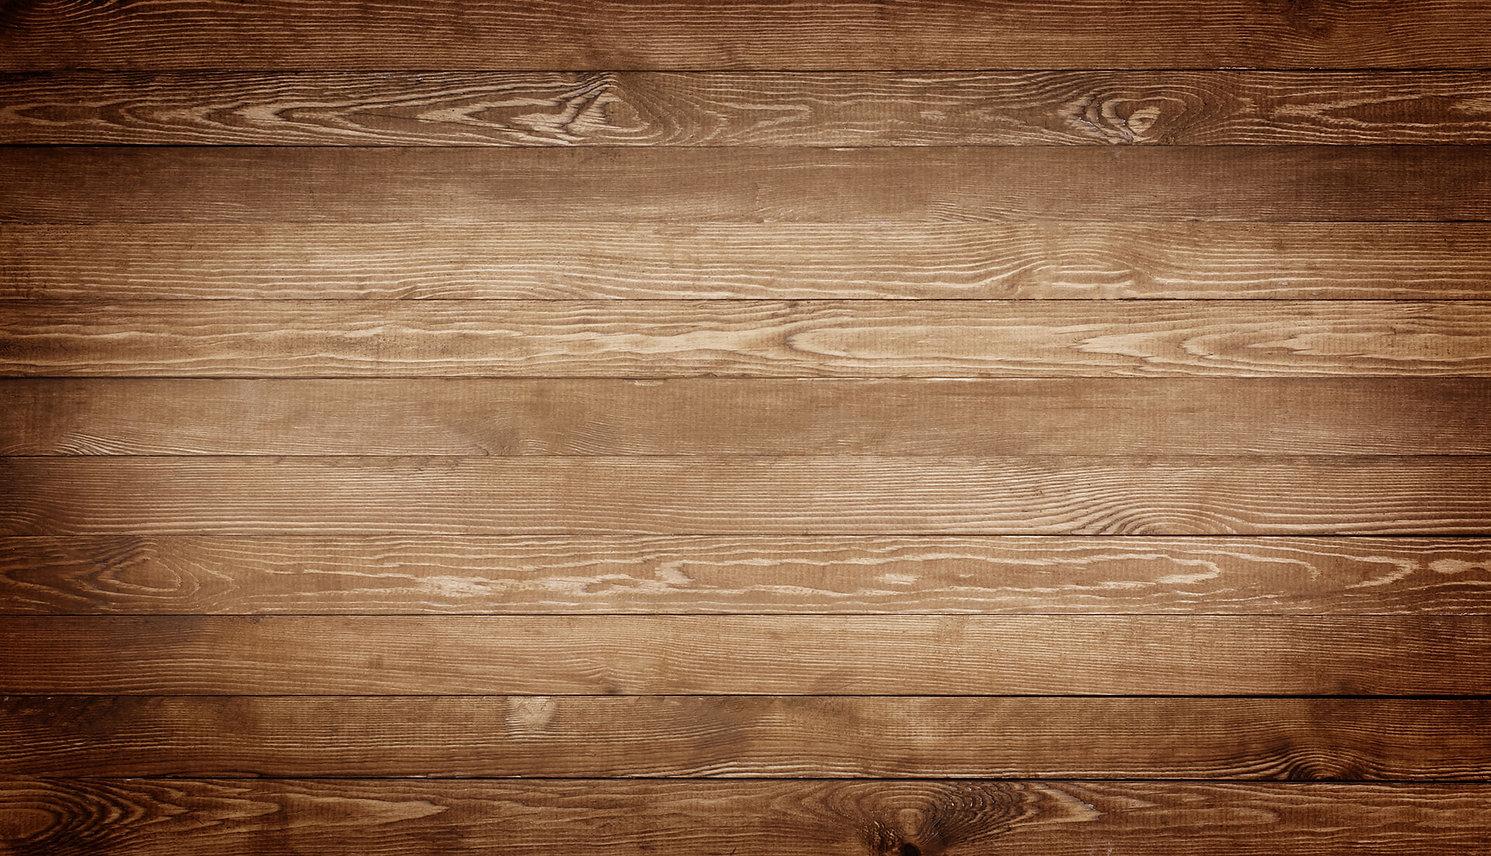 Wood-Grain-Background-1.jpg